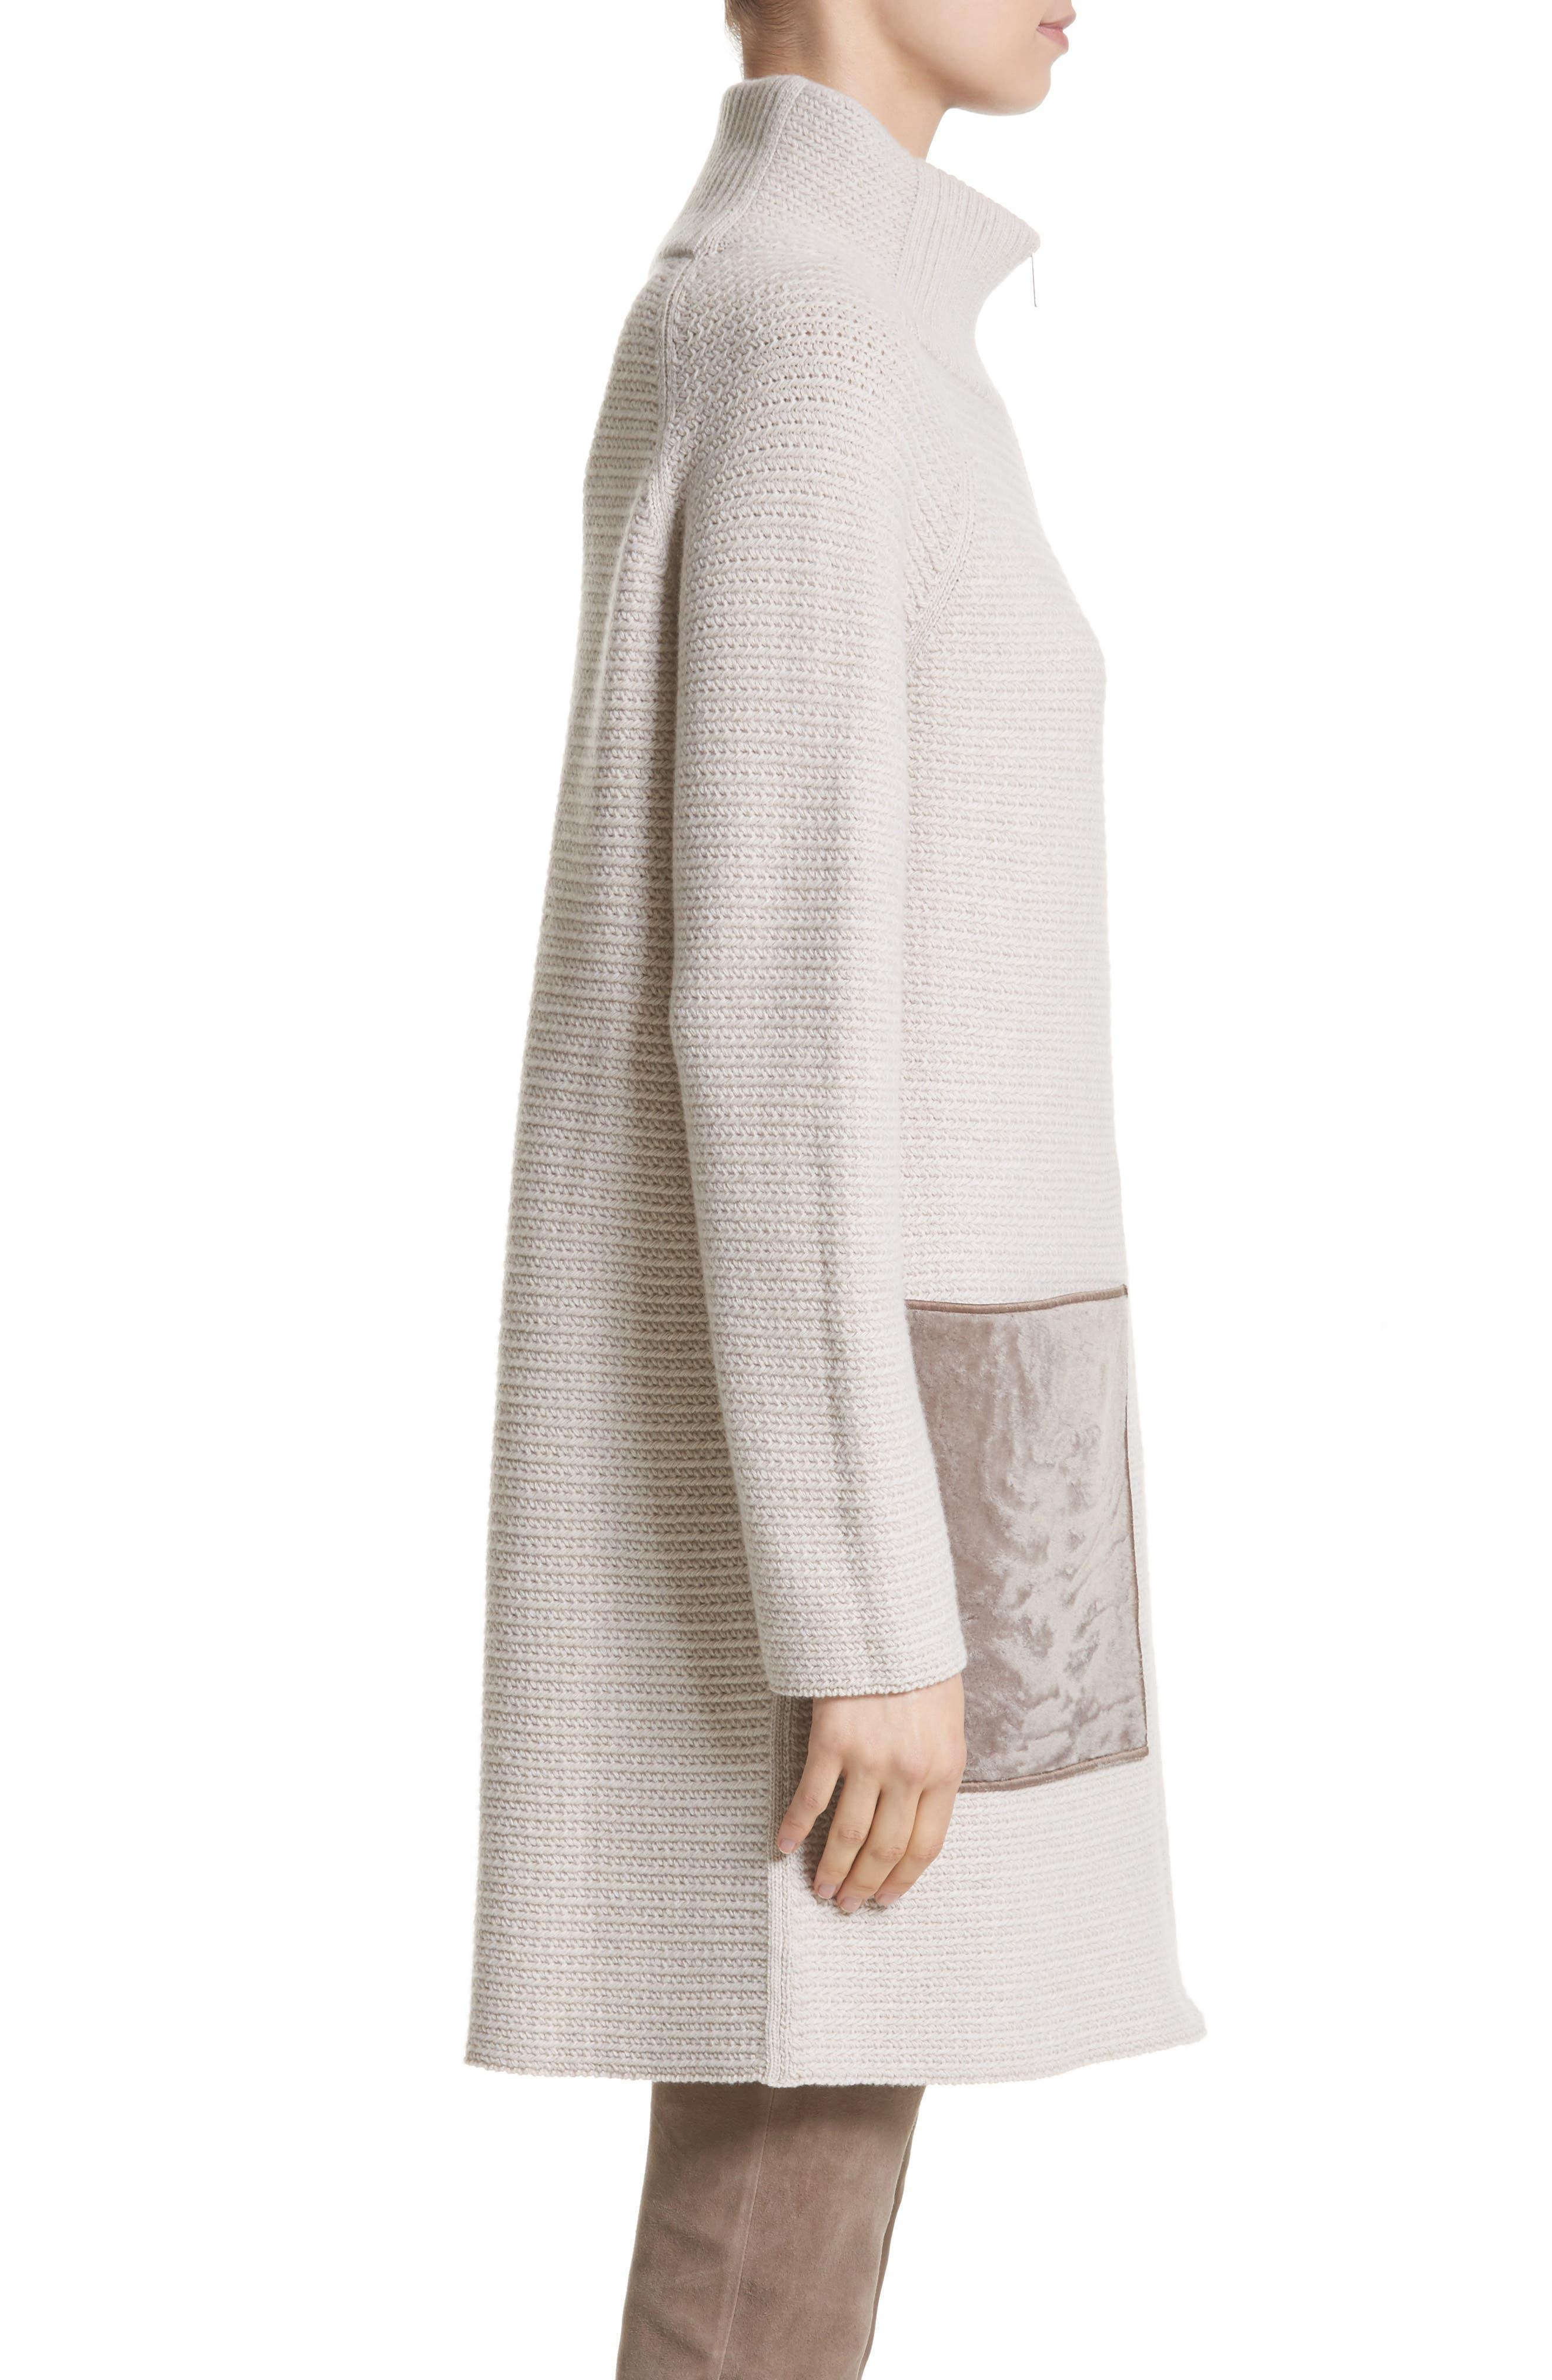 Alternate Image 3  - Lafayette 148 New York Wool & Cashmere Herringbone Stitch Cardigan with Genuine Shearling Pockets